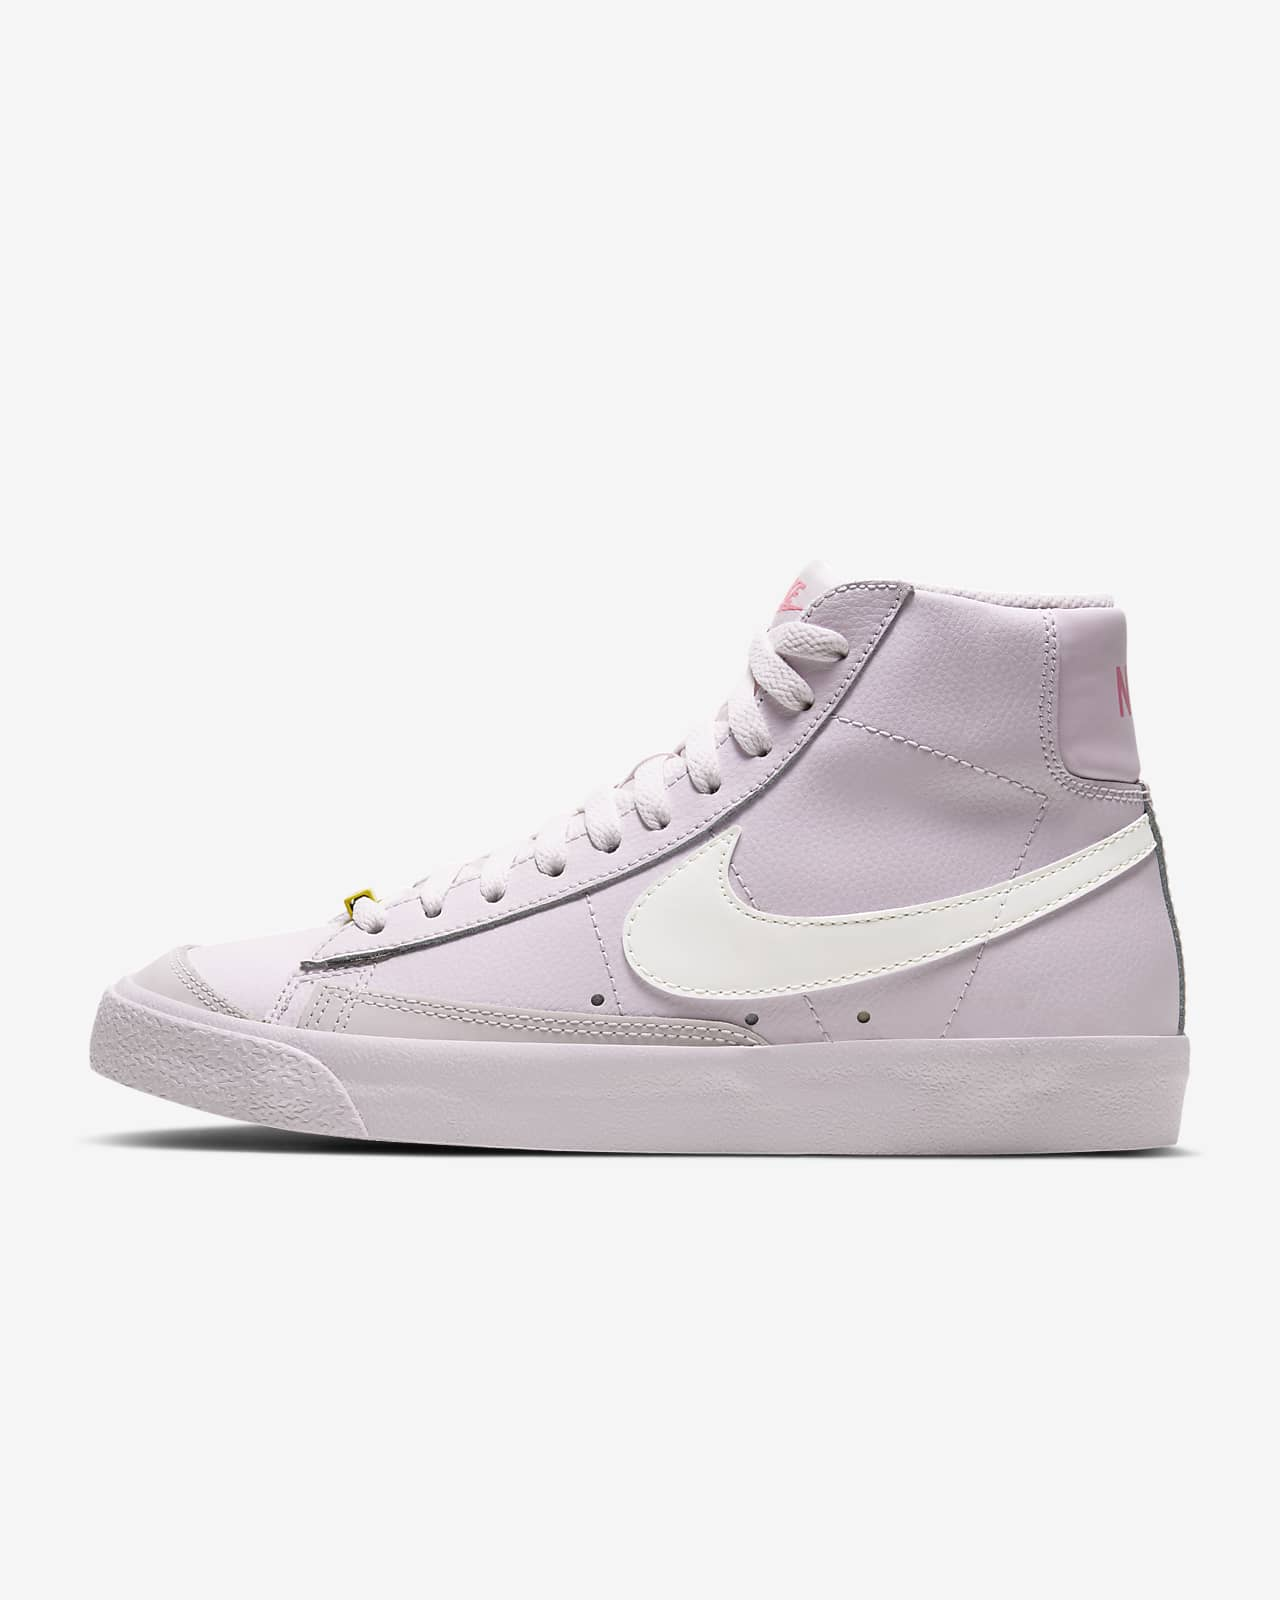 Nike Blazer Mid '77-sko til kvinder